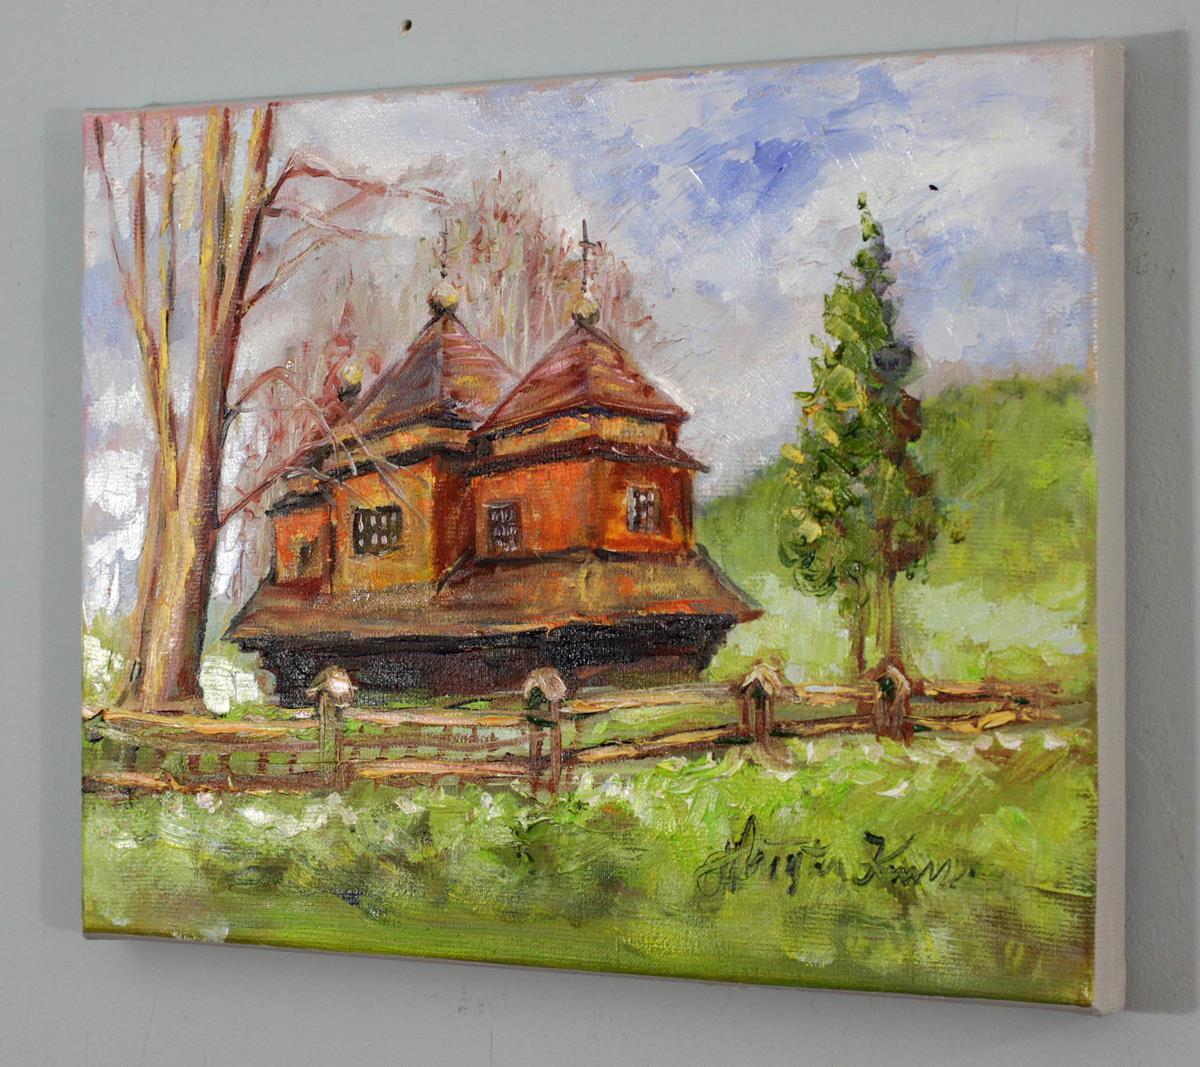 Cerkiew Smolniku